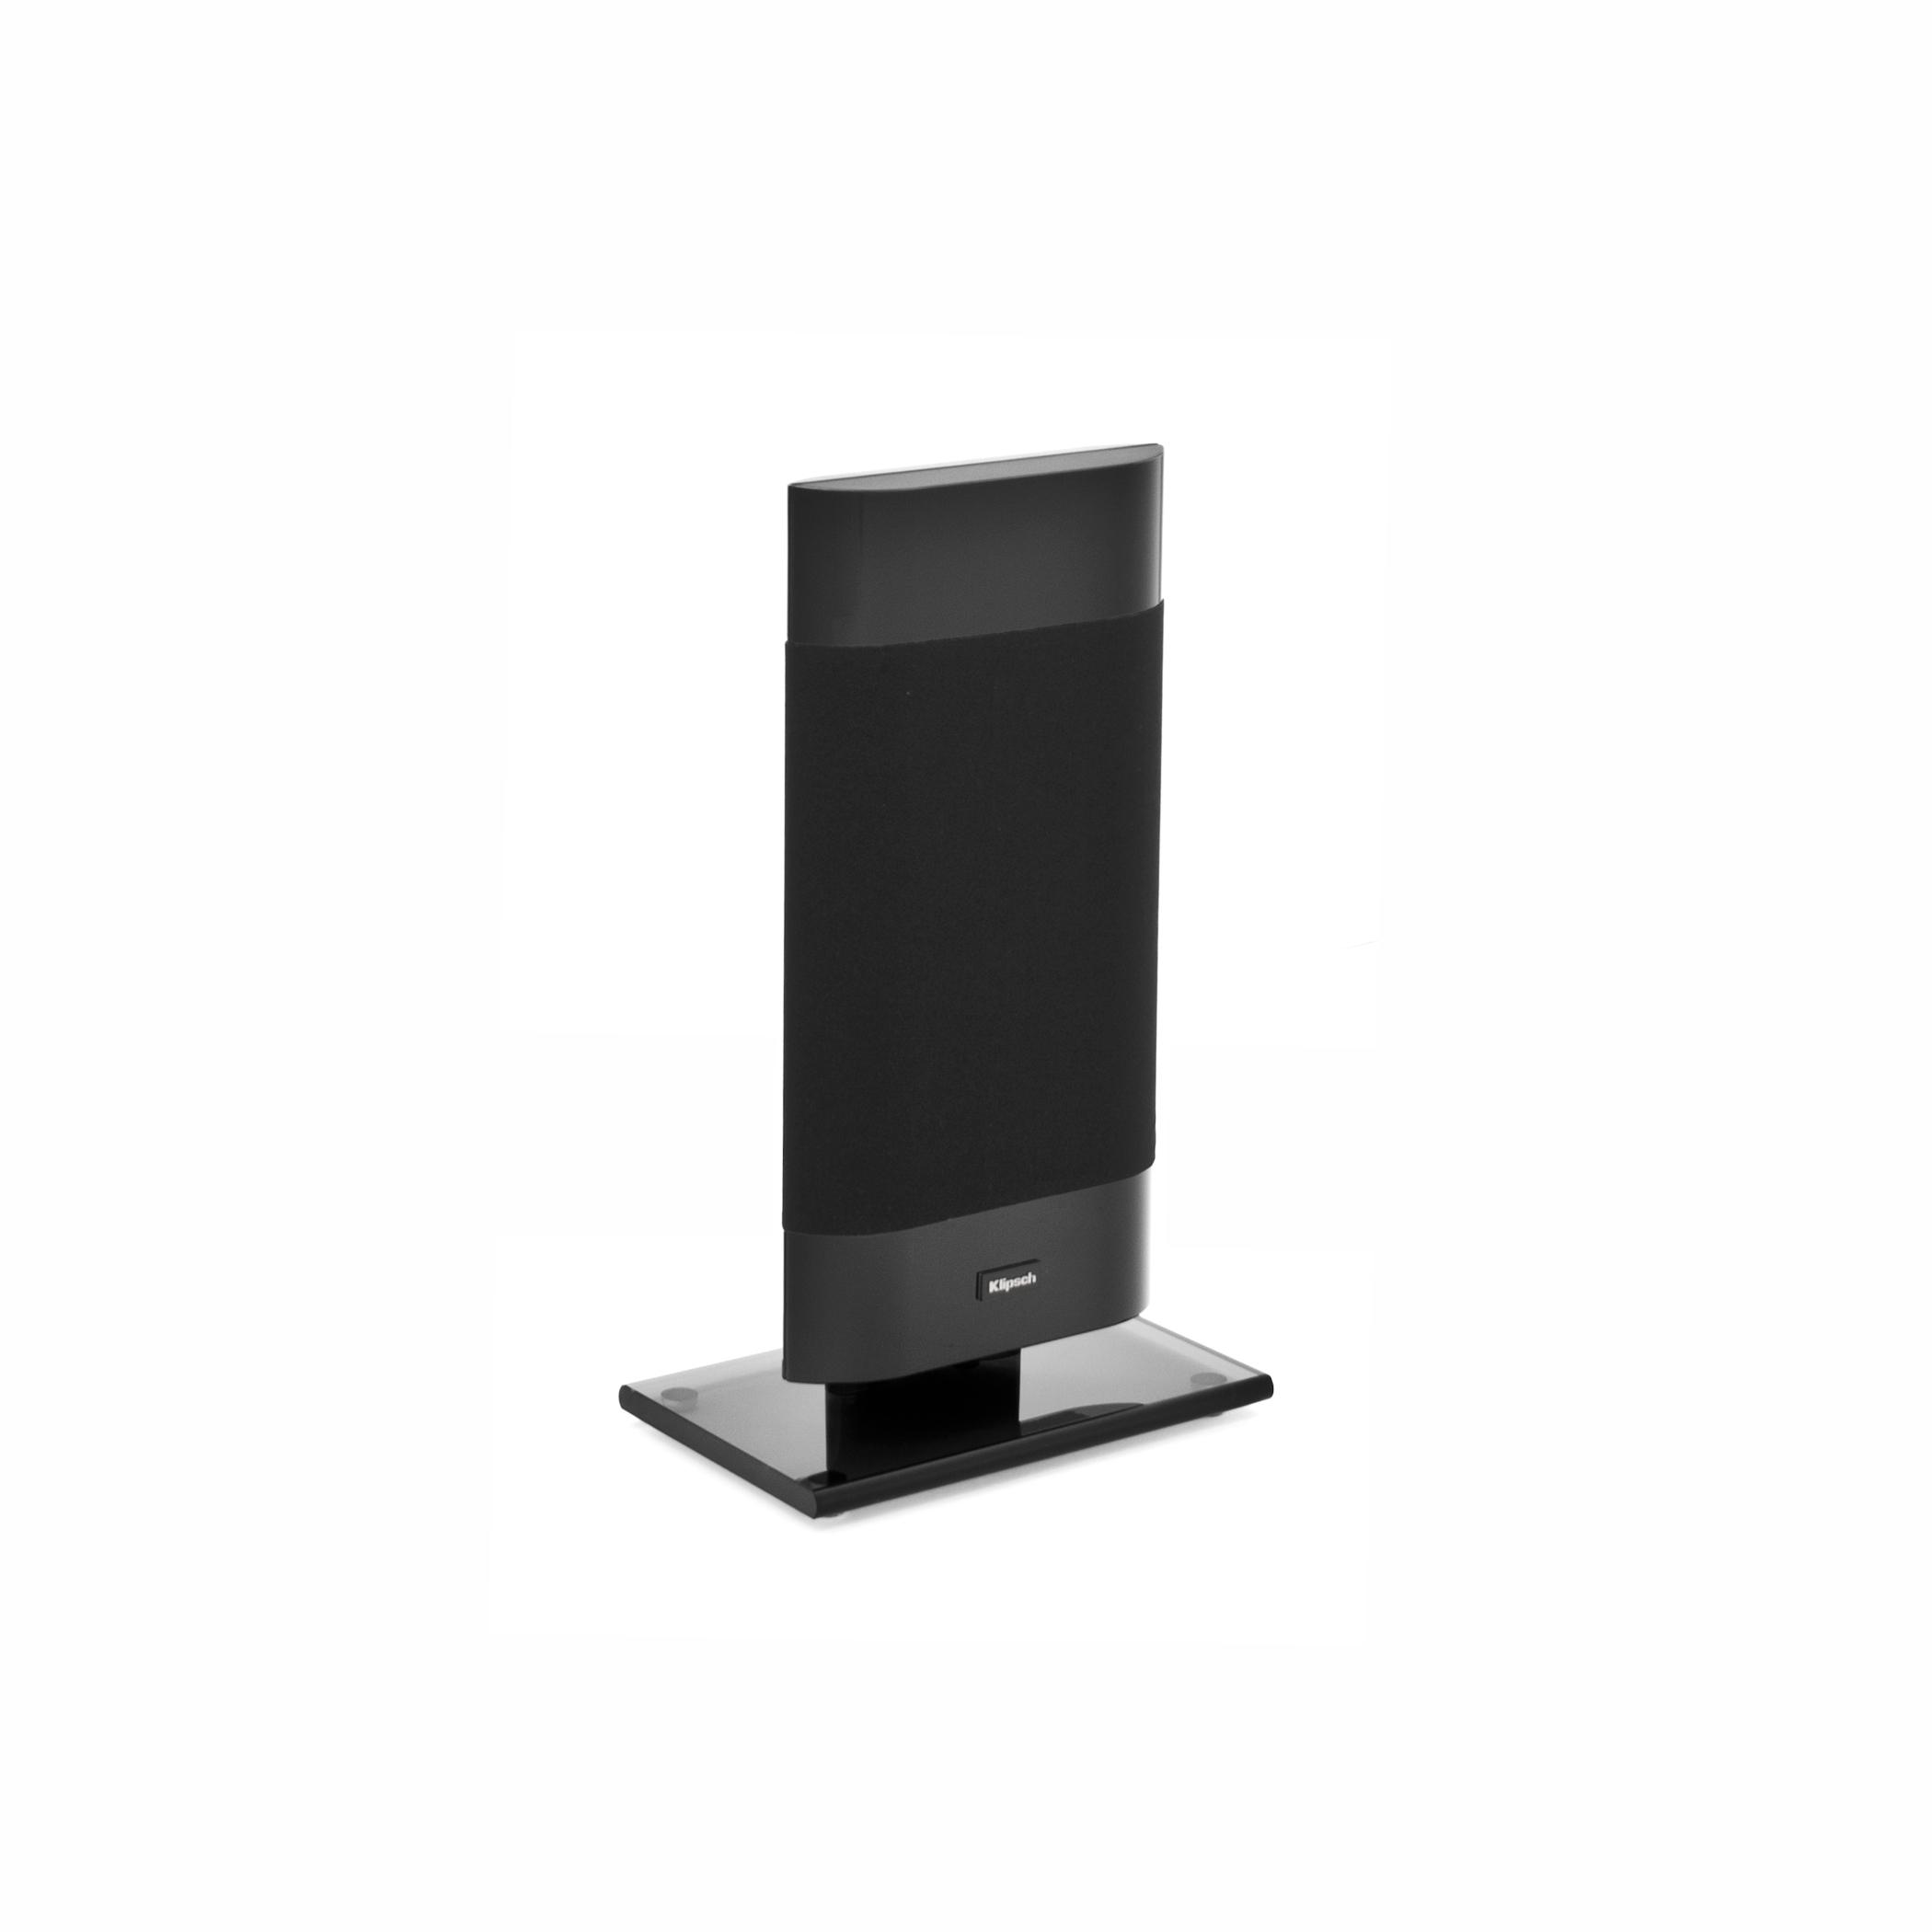 Klipsch Gallery G-12 Flat Panel Speaker, Klipsch Speakers, Klipsch